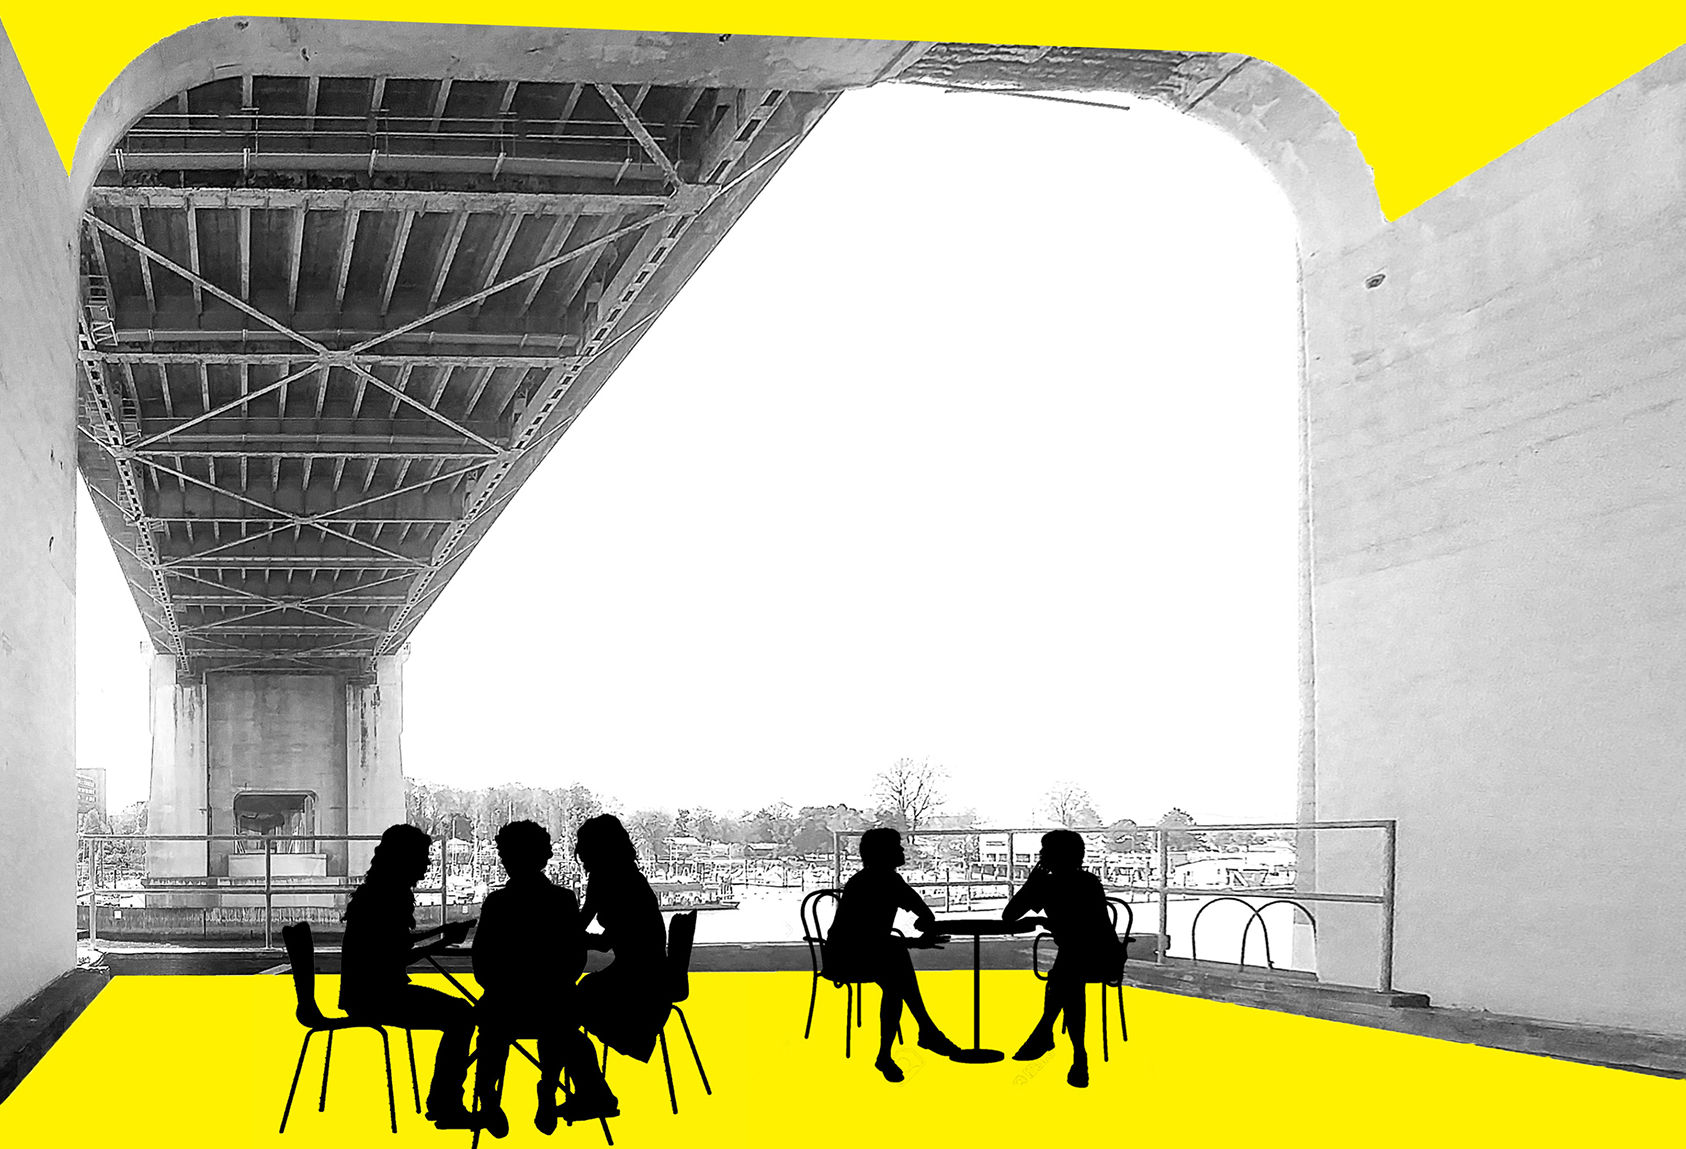 B16 – Burrard Bridge Lookout Lounge